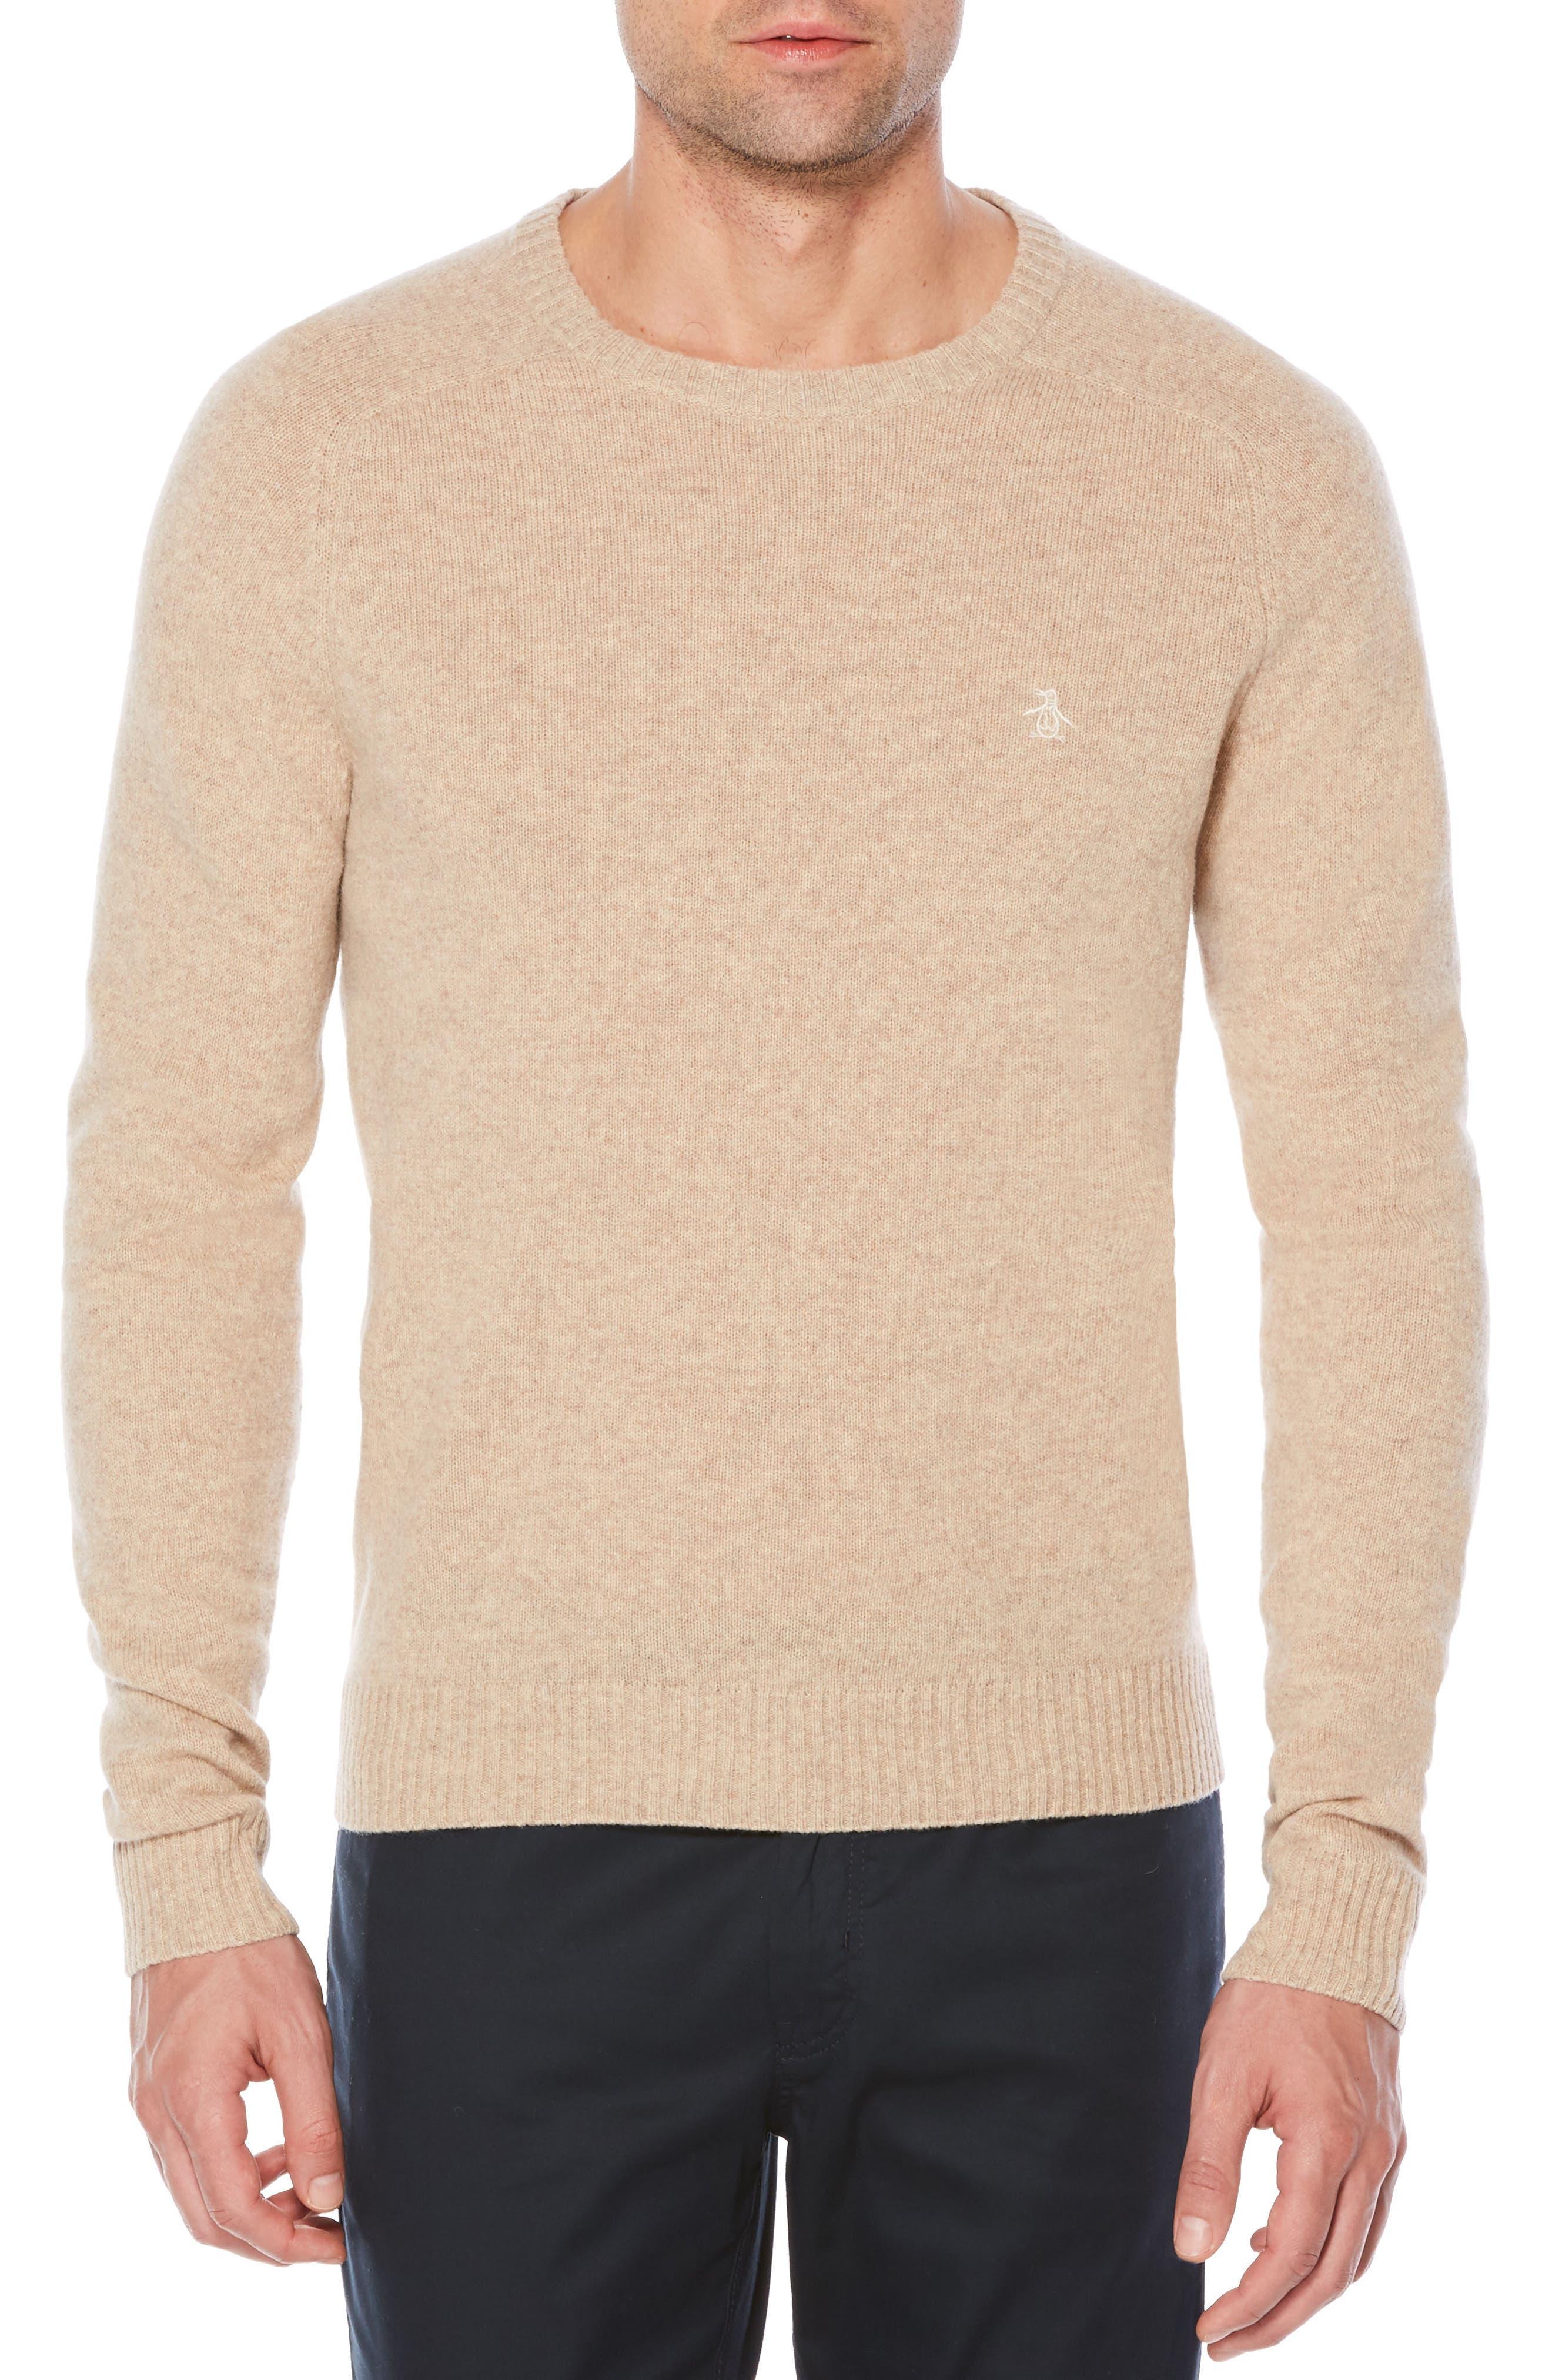 P55 Lambswool Sweater,                             Main thumbnail 1, color,